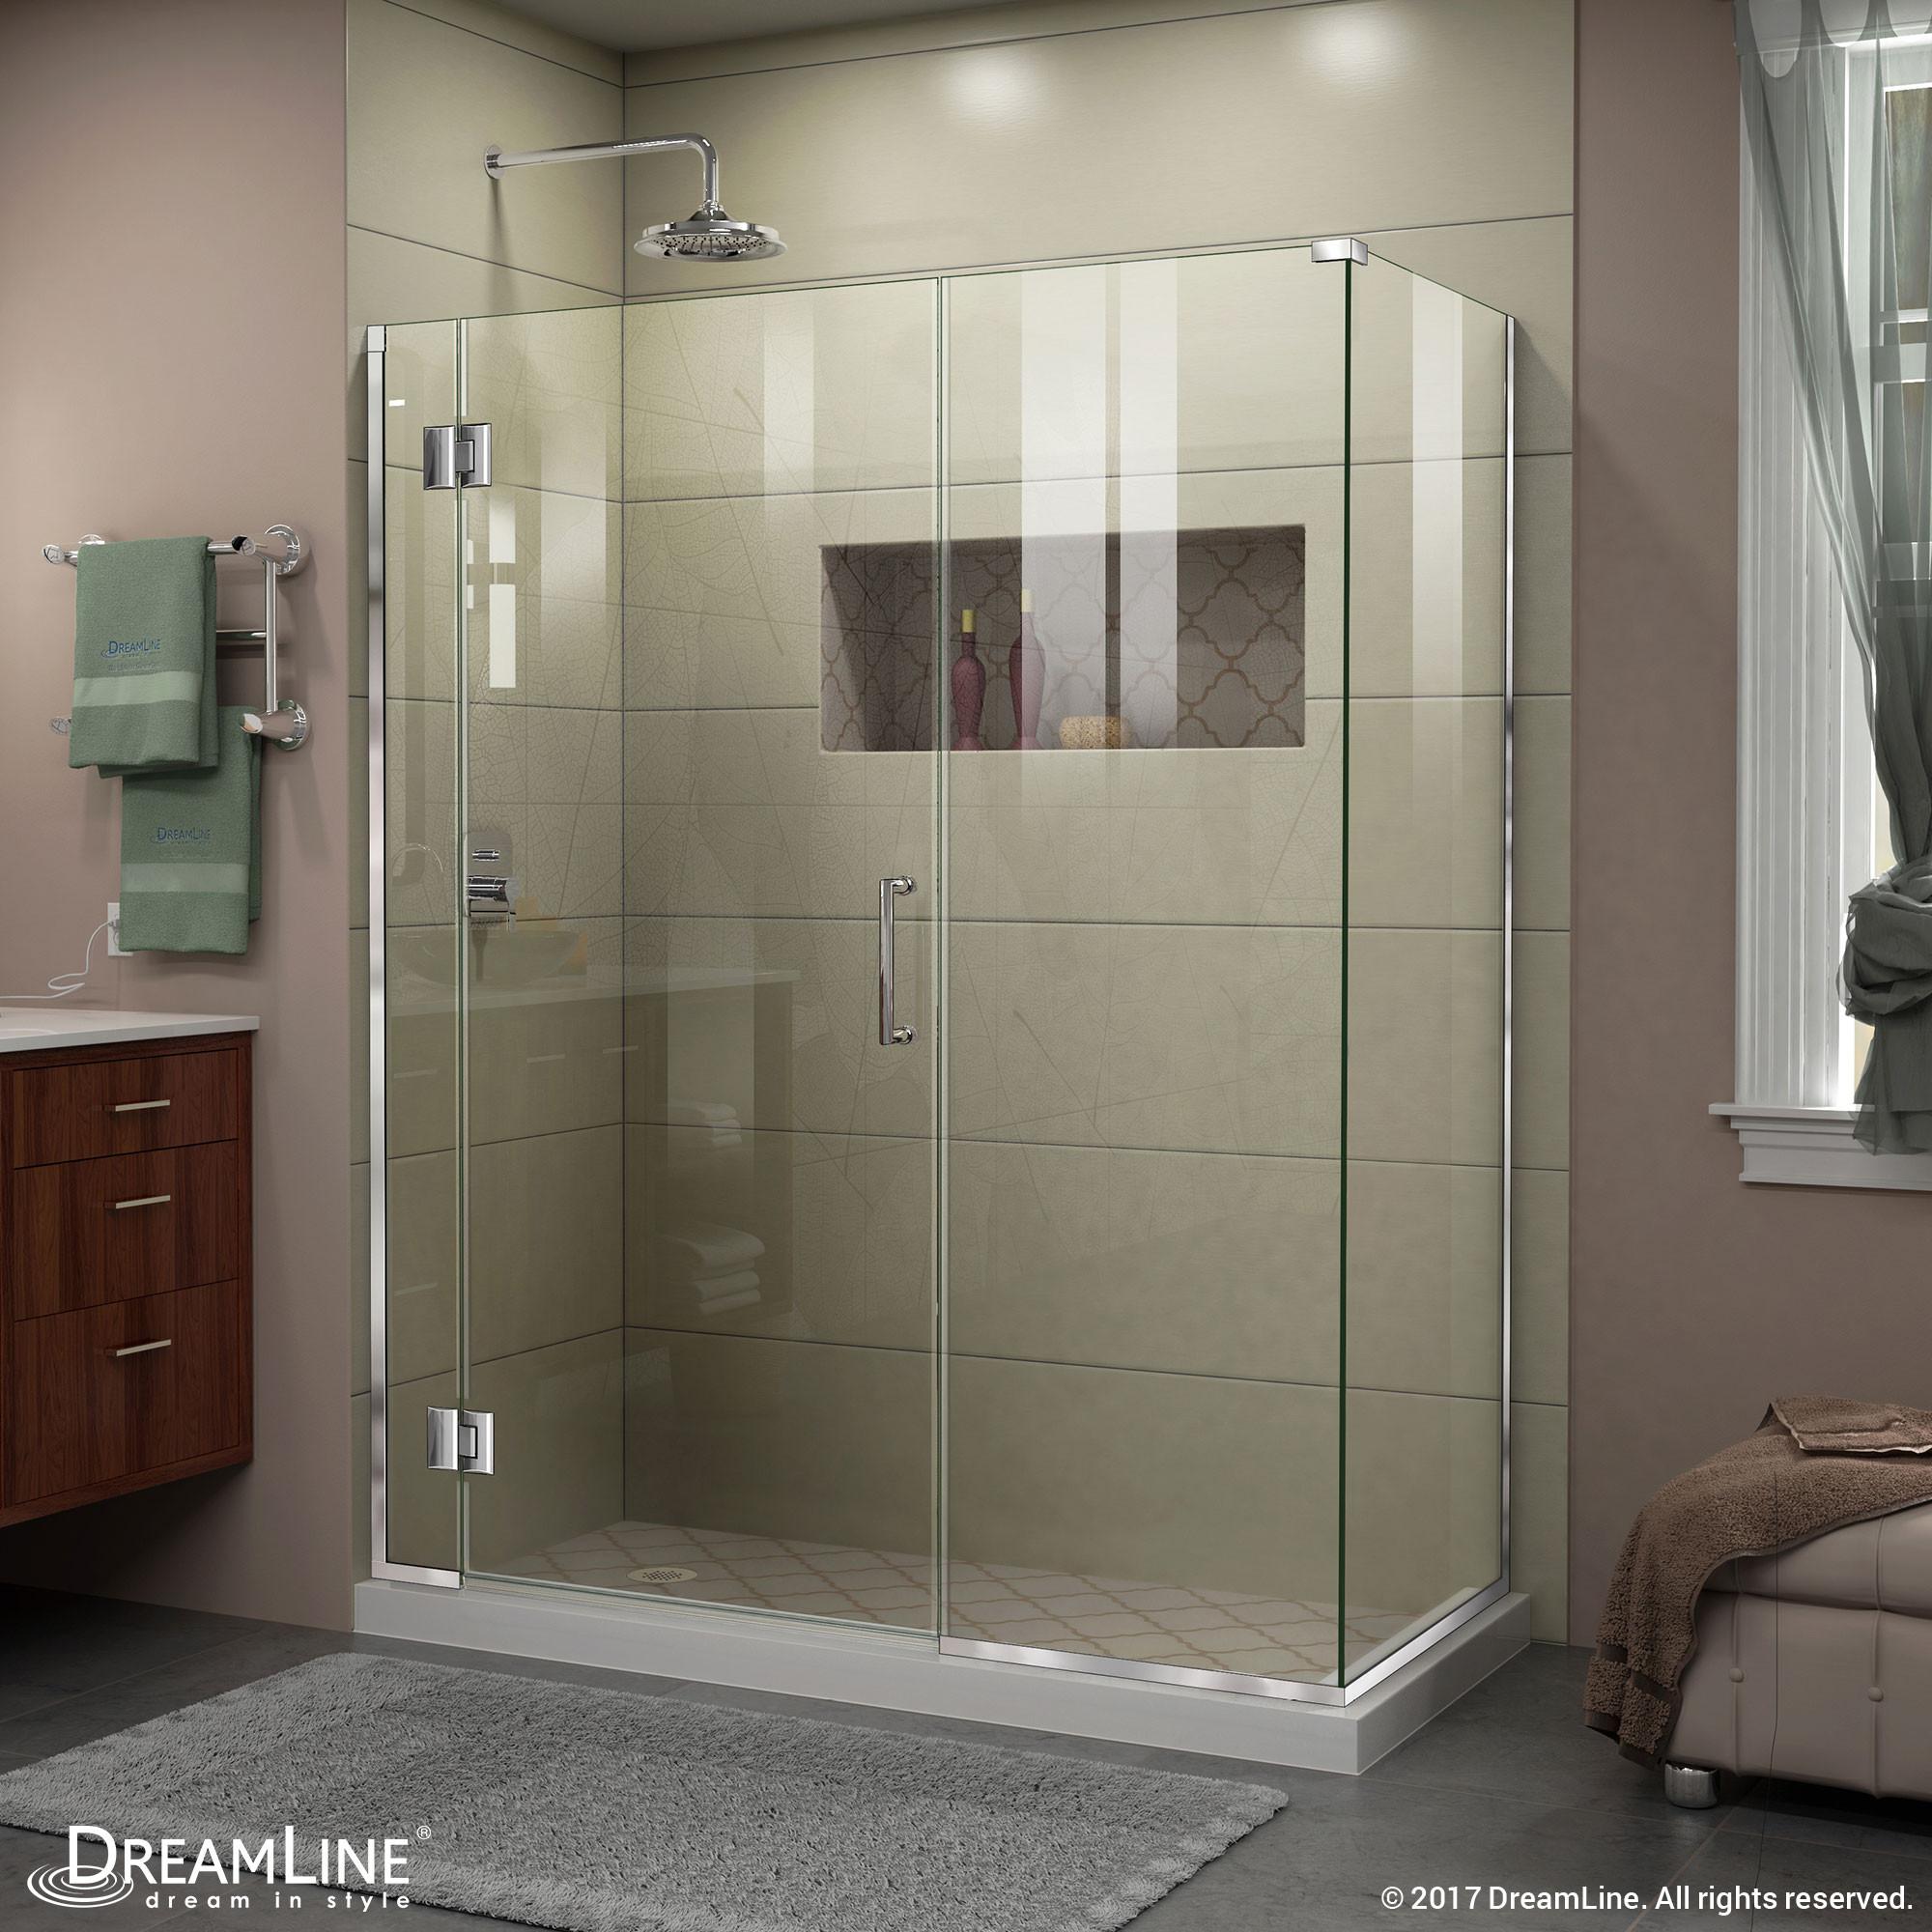 DreamLine E1251430-01 Unidoor-X Hinged Shower Enclosure In Chrome Finish